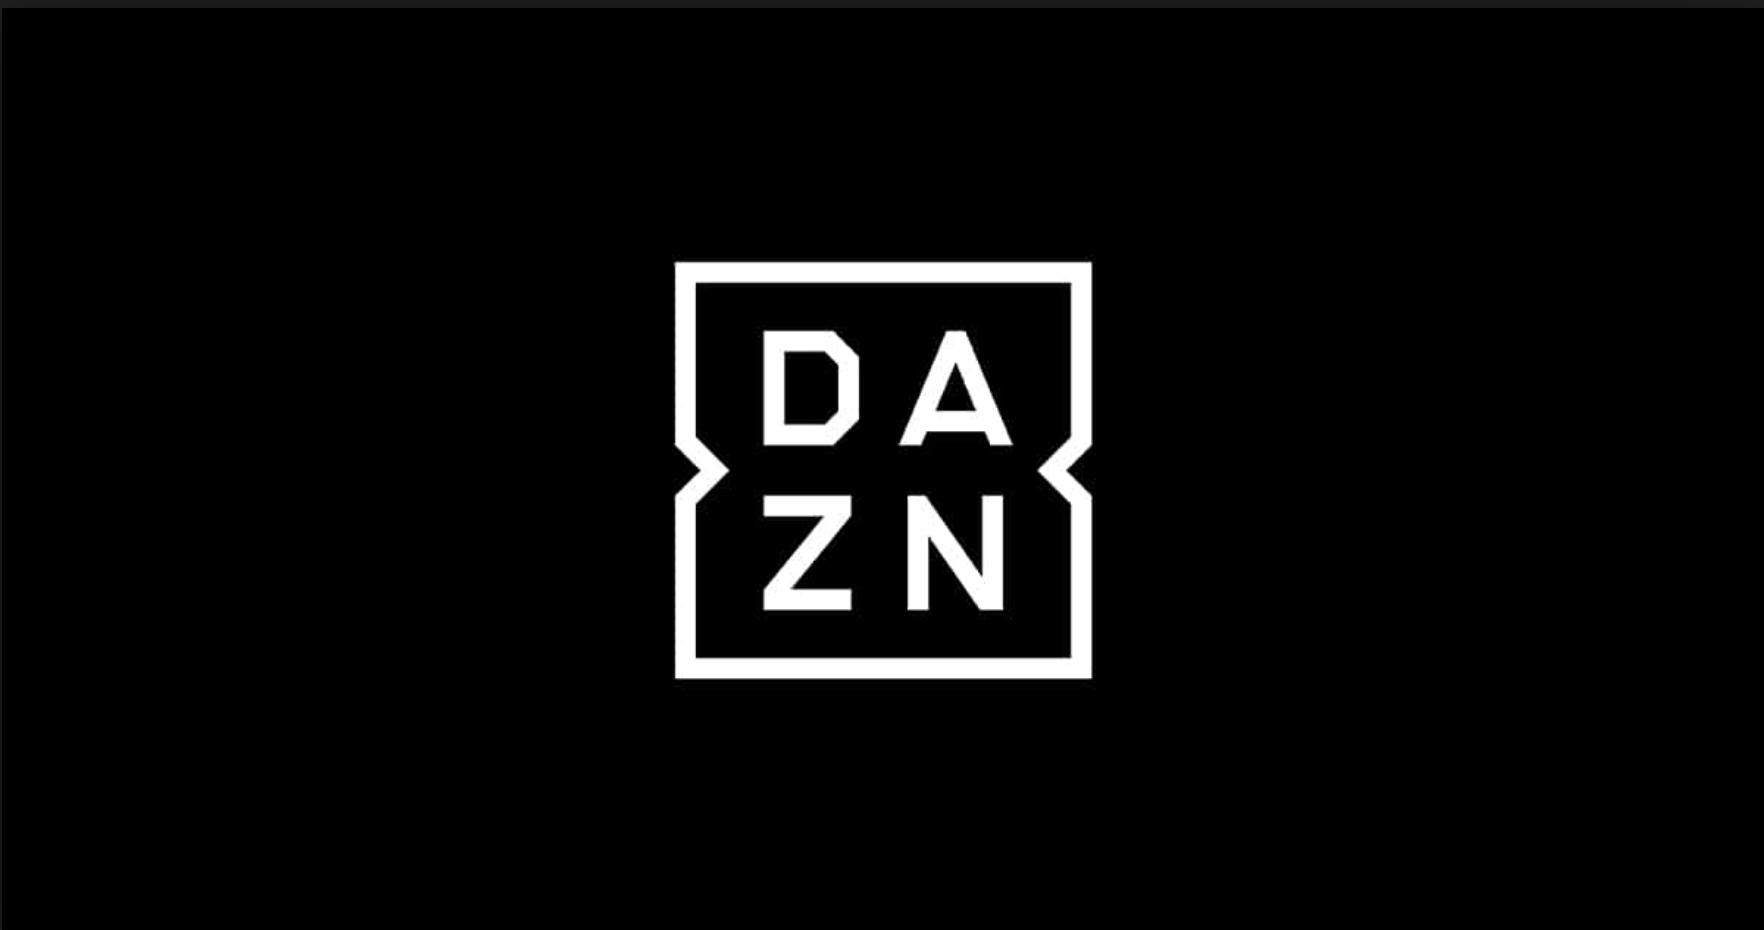 Come vedere DAZN su Fire TV Stick Chromecast o Smart TV 1